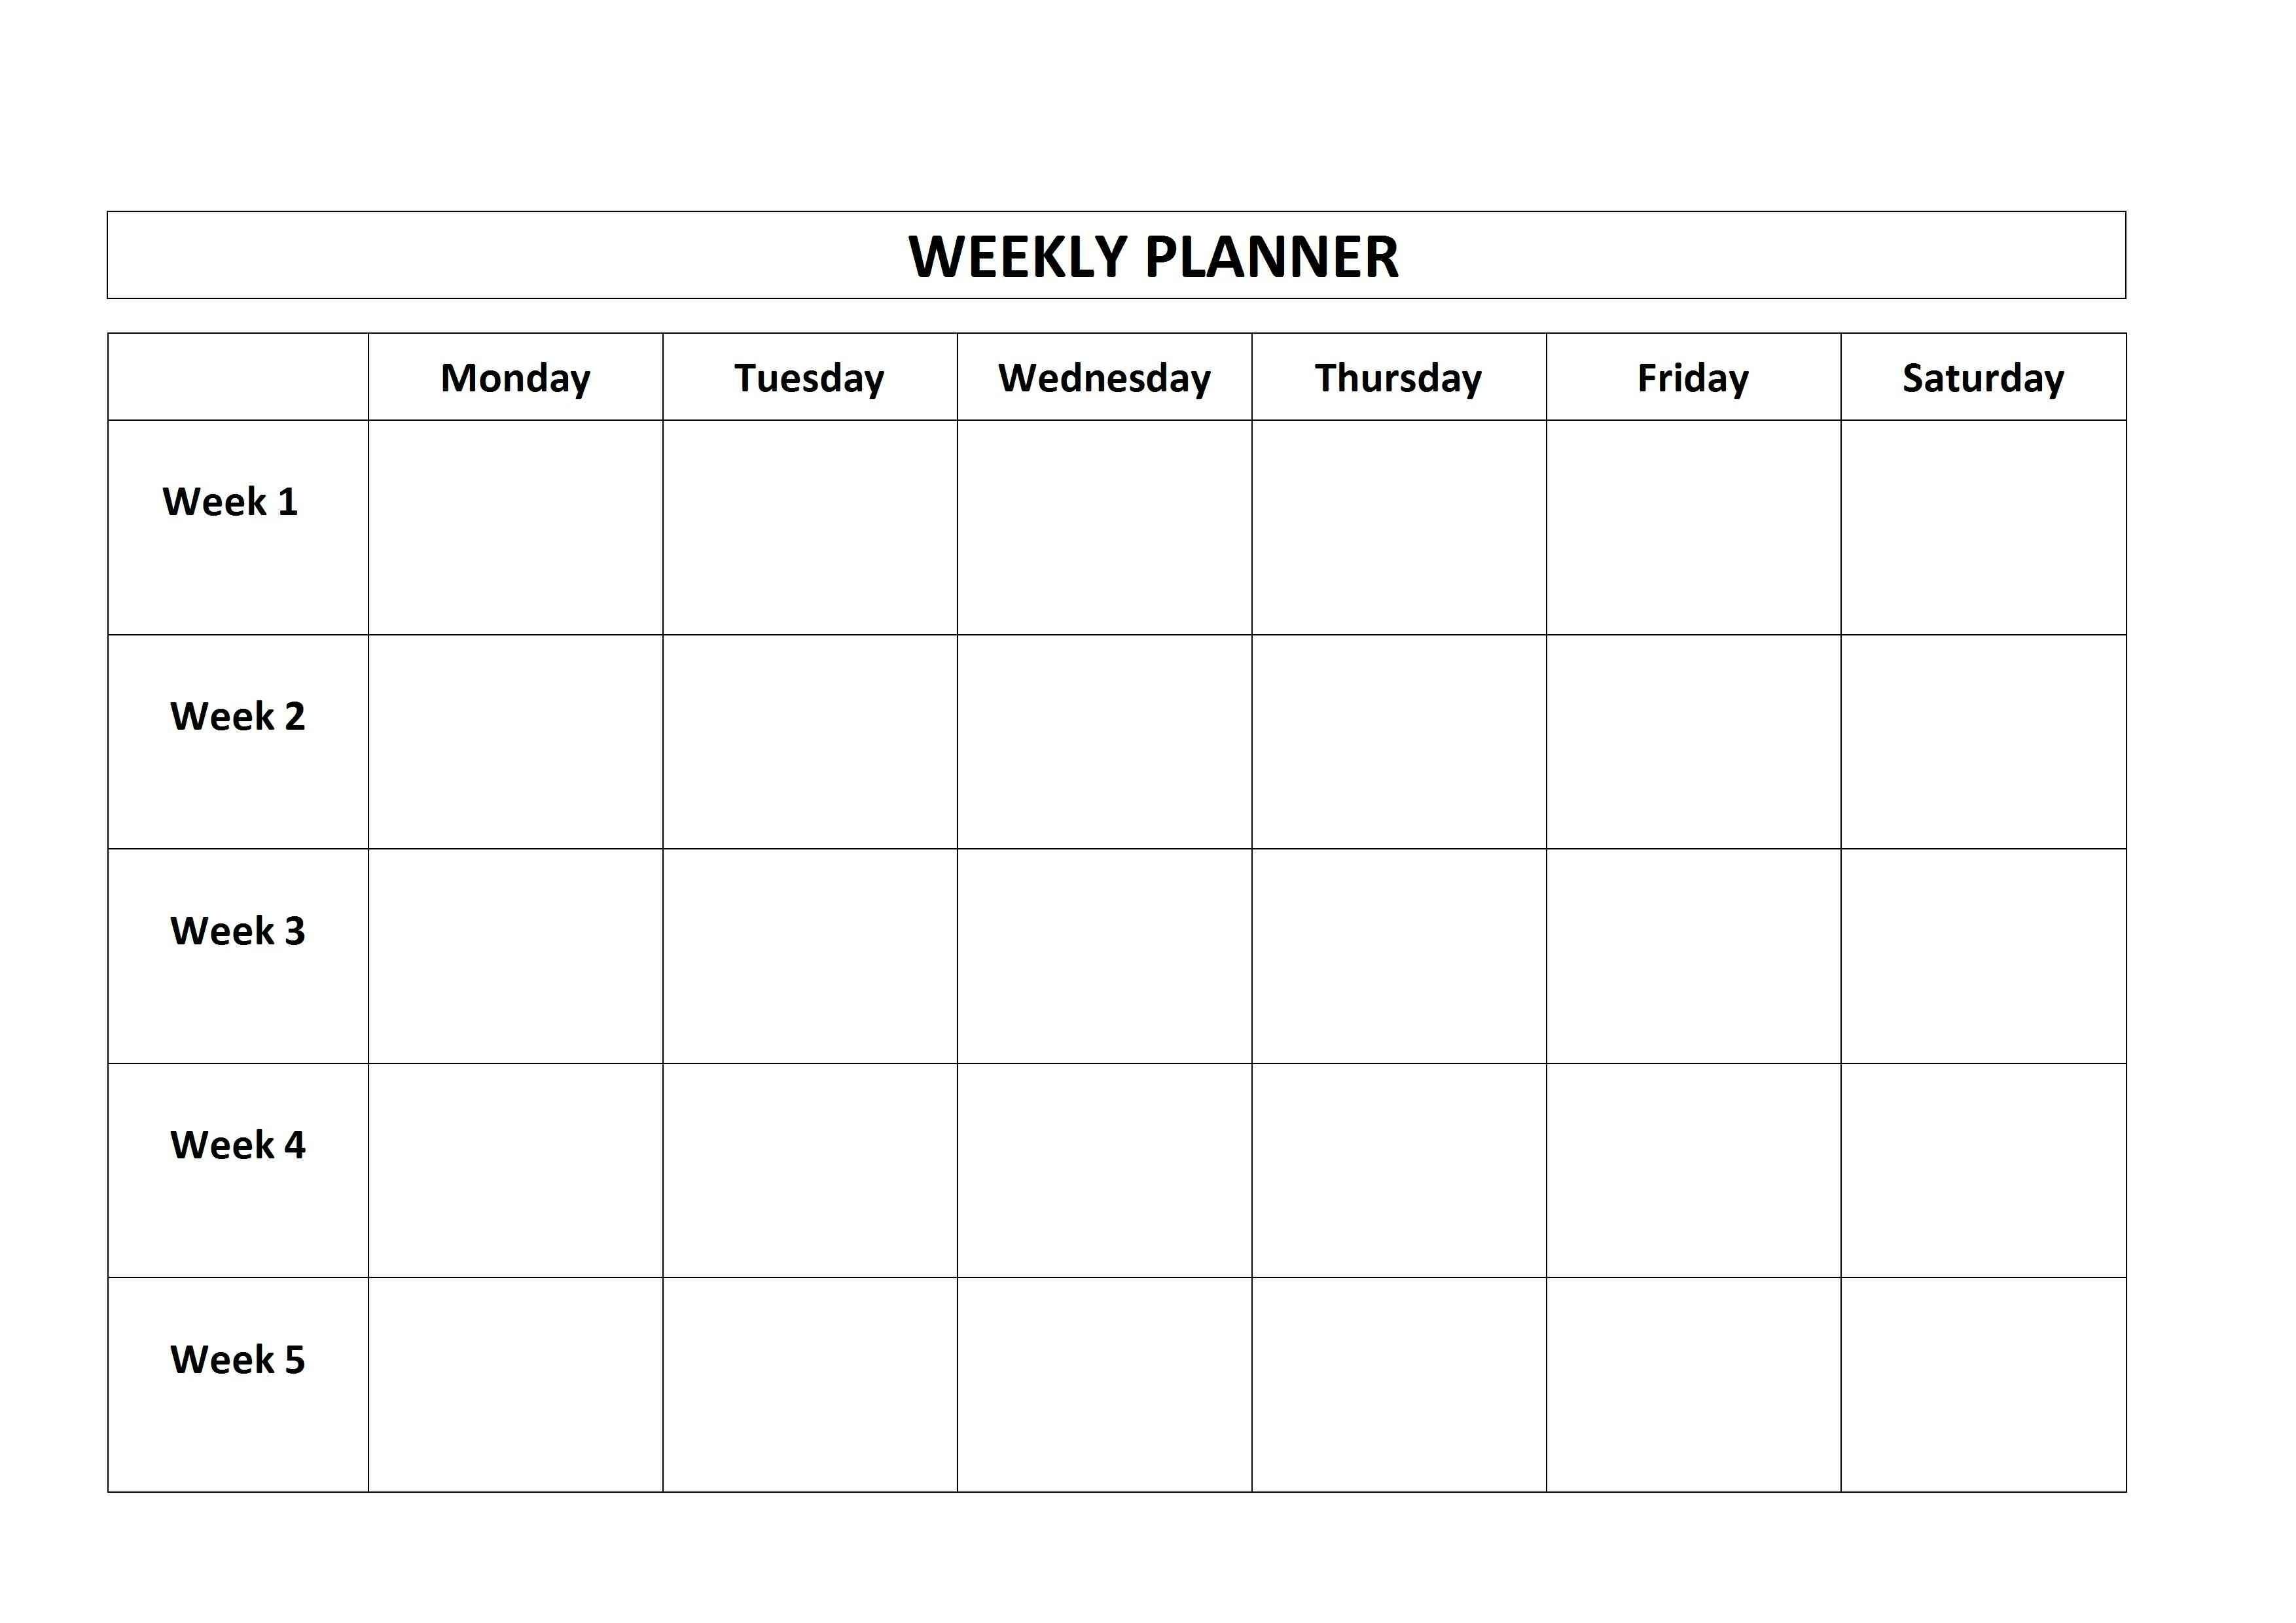 Monday To Friday Schedule Te Holidays Calendar Through Class